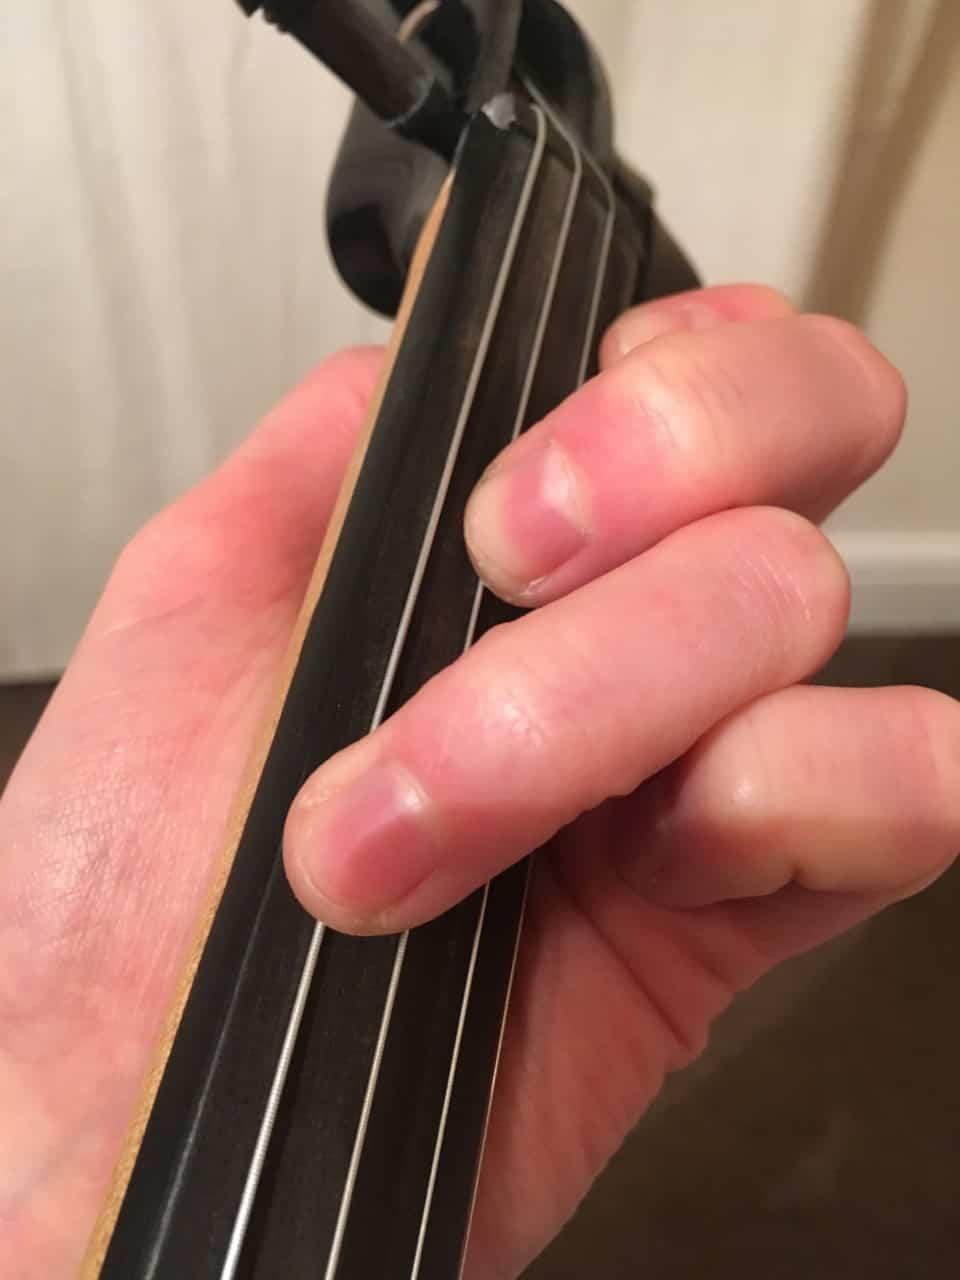 f major violin chord